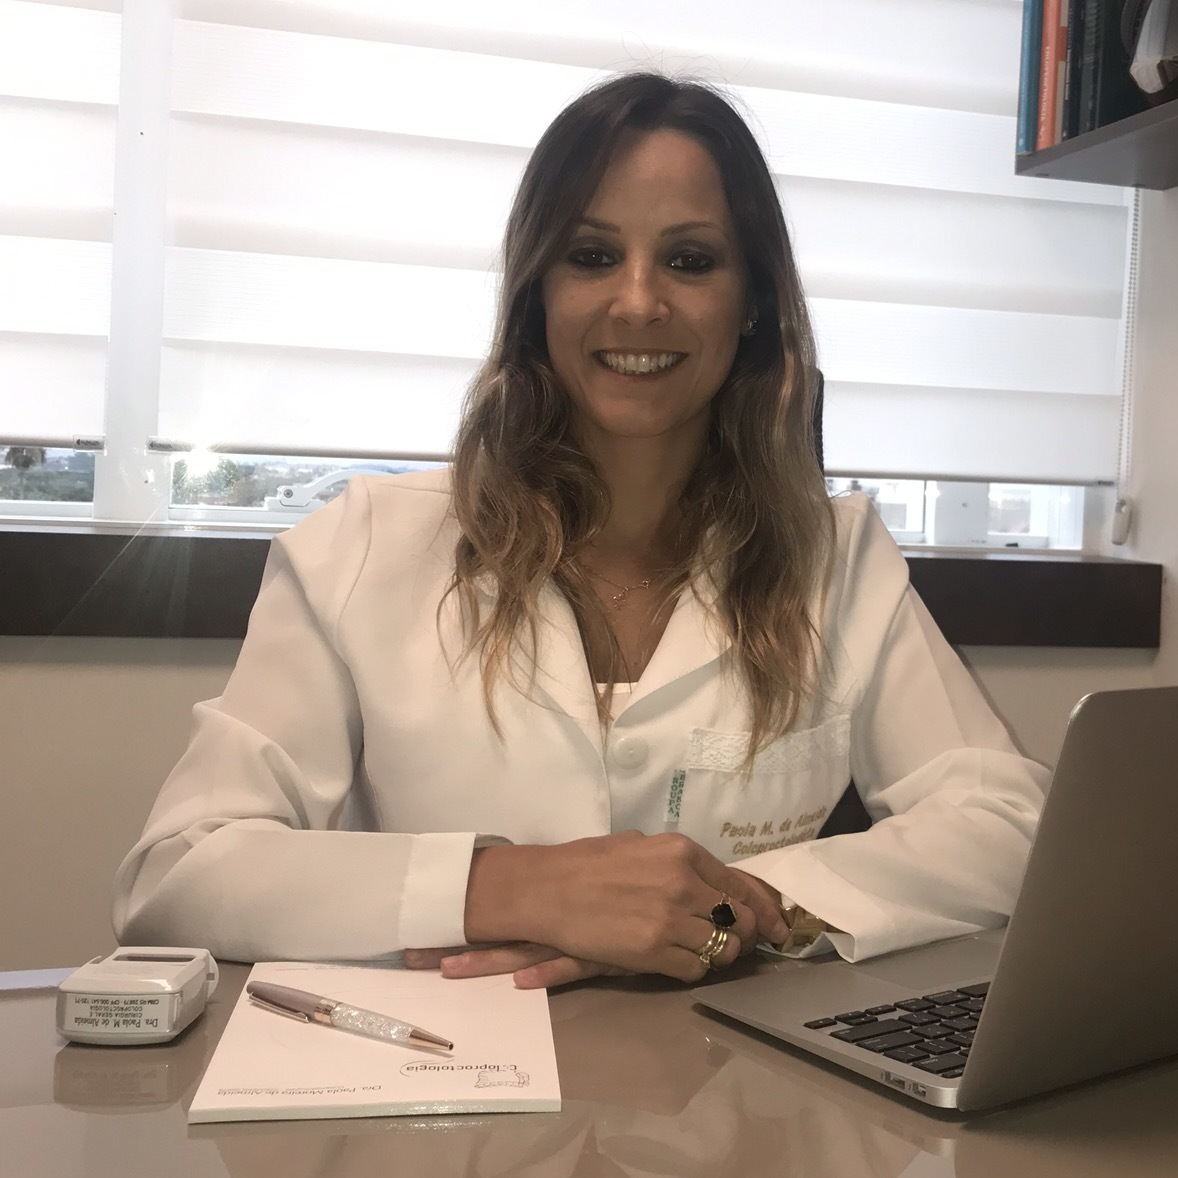 Paola Moreira de Almeida